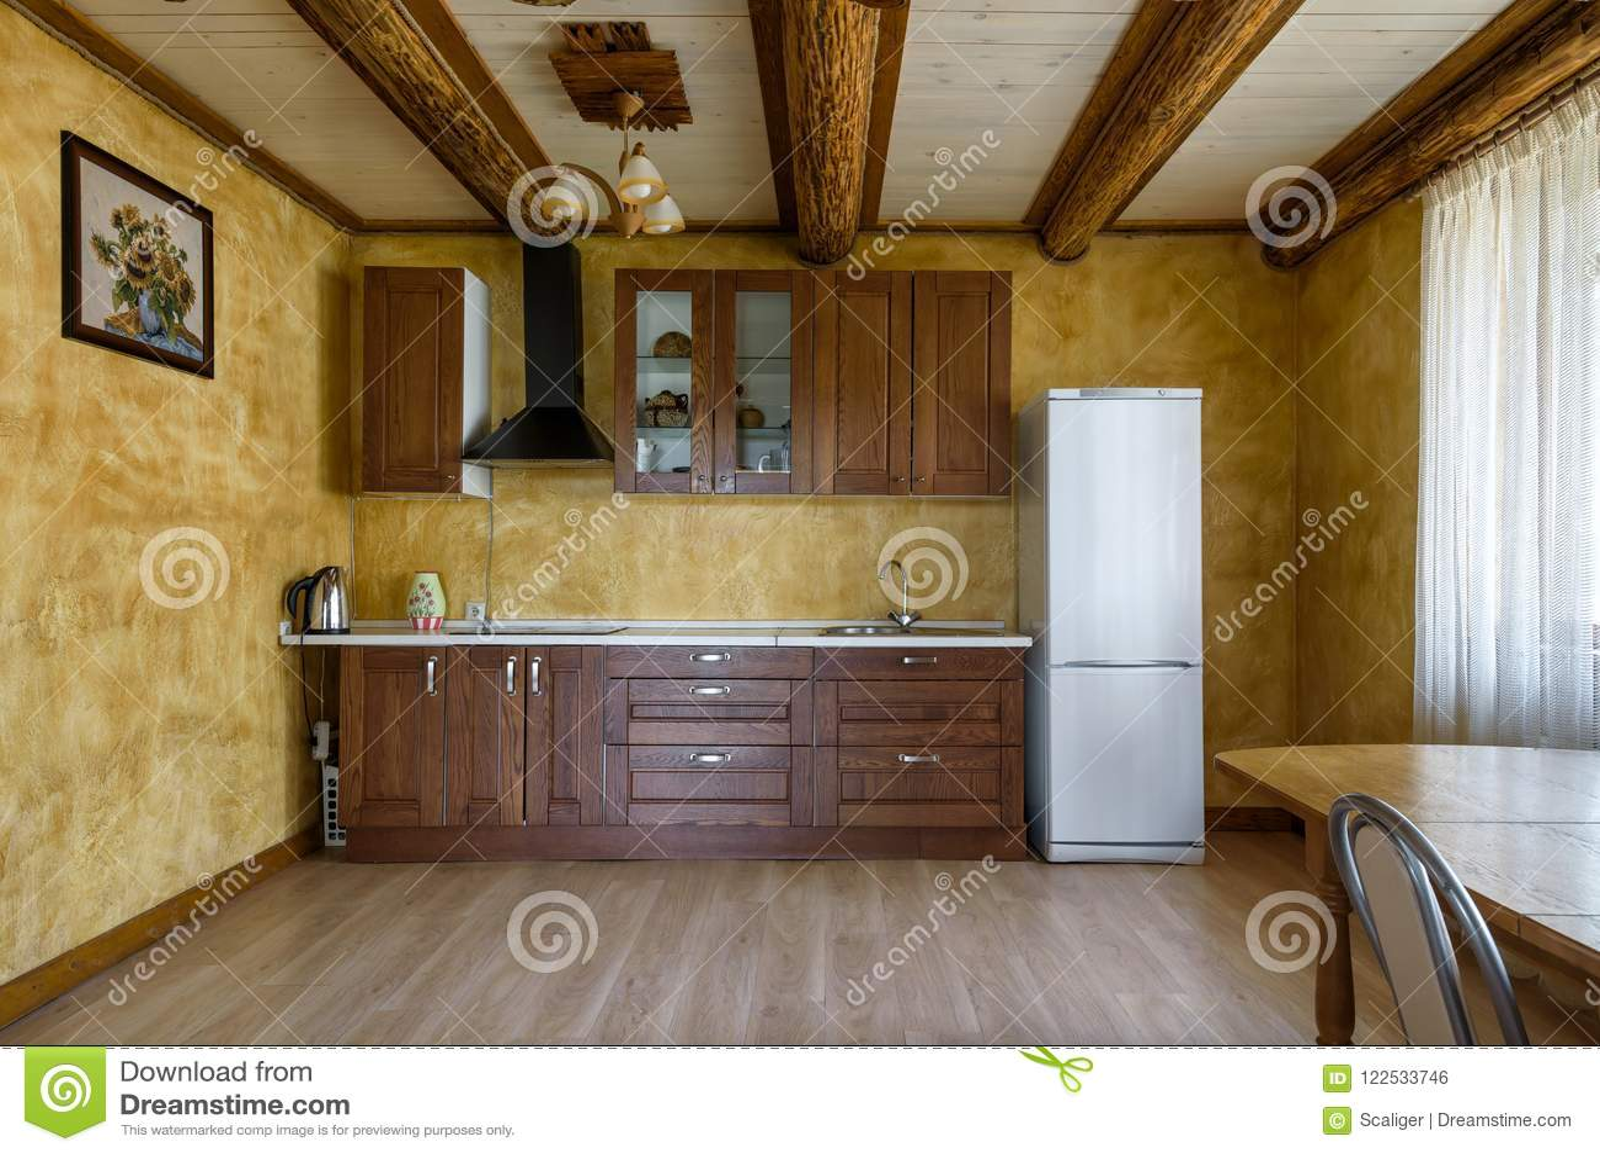 Daglicht Je Keuken : Binnenland van keuken in buitenhuis of hotel redactionele foto